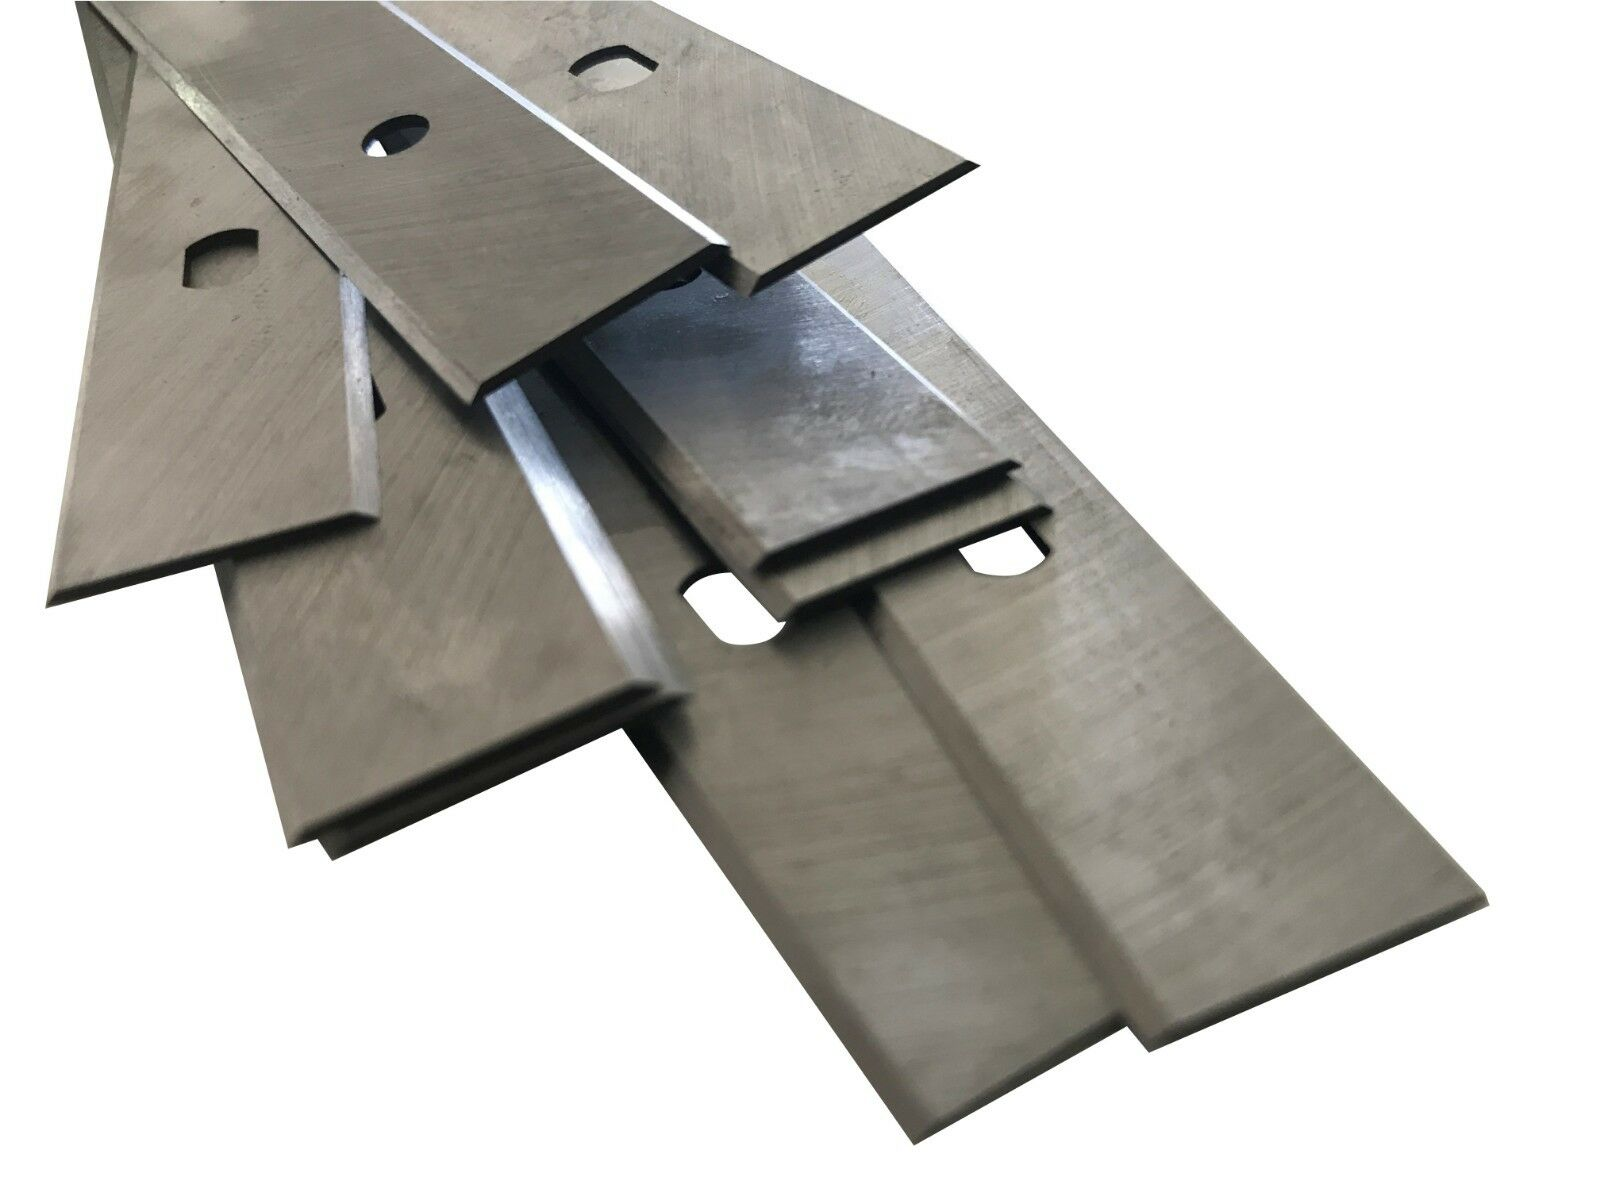 HSS Planer Blades to suit Elektra Beckum HC260M,HC260C machines ONE PAIR S700S3